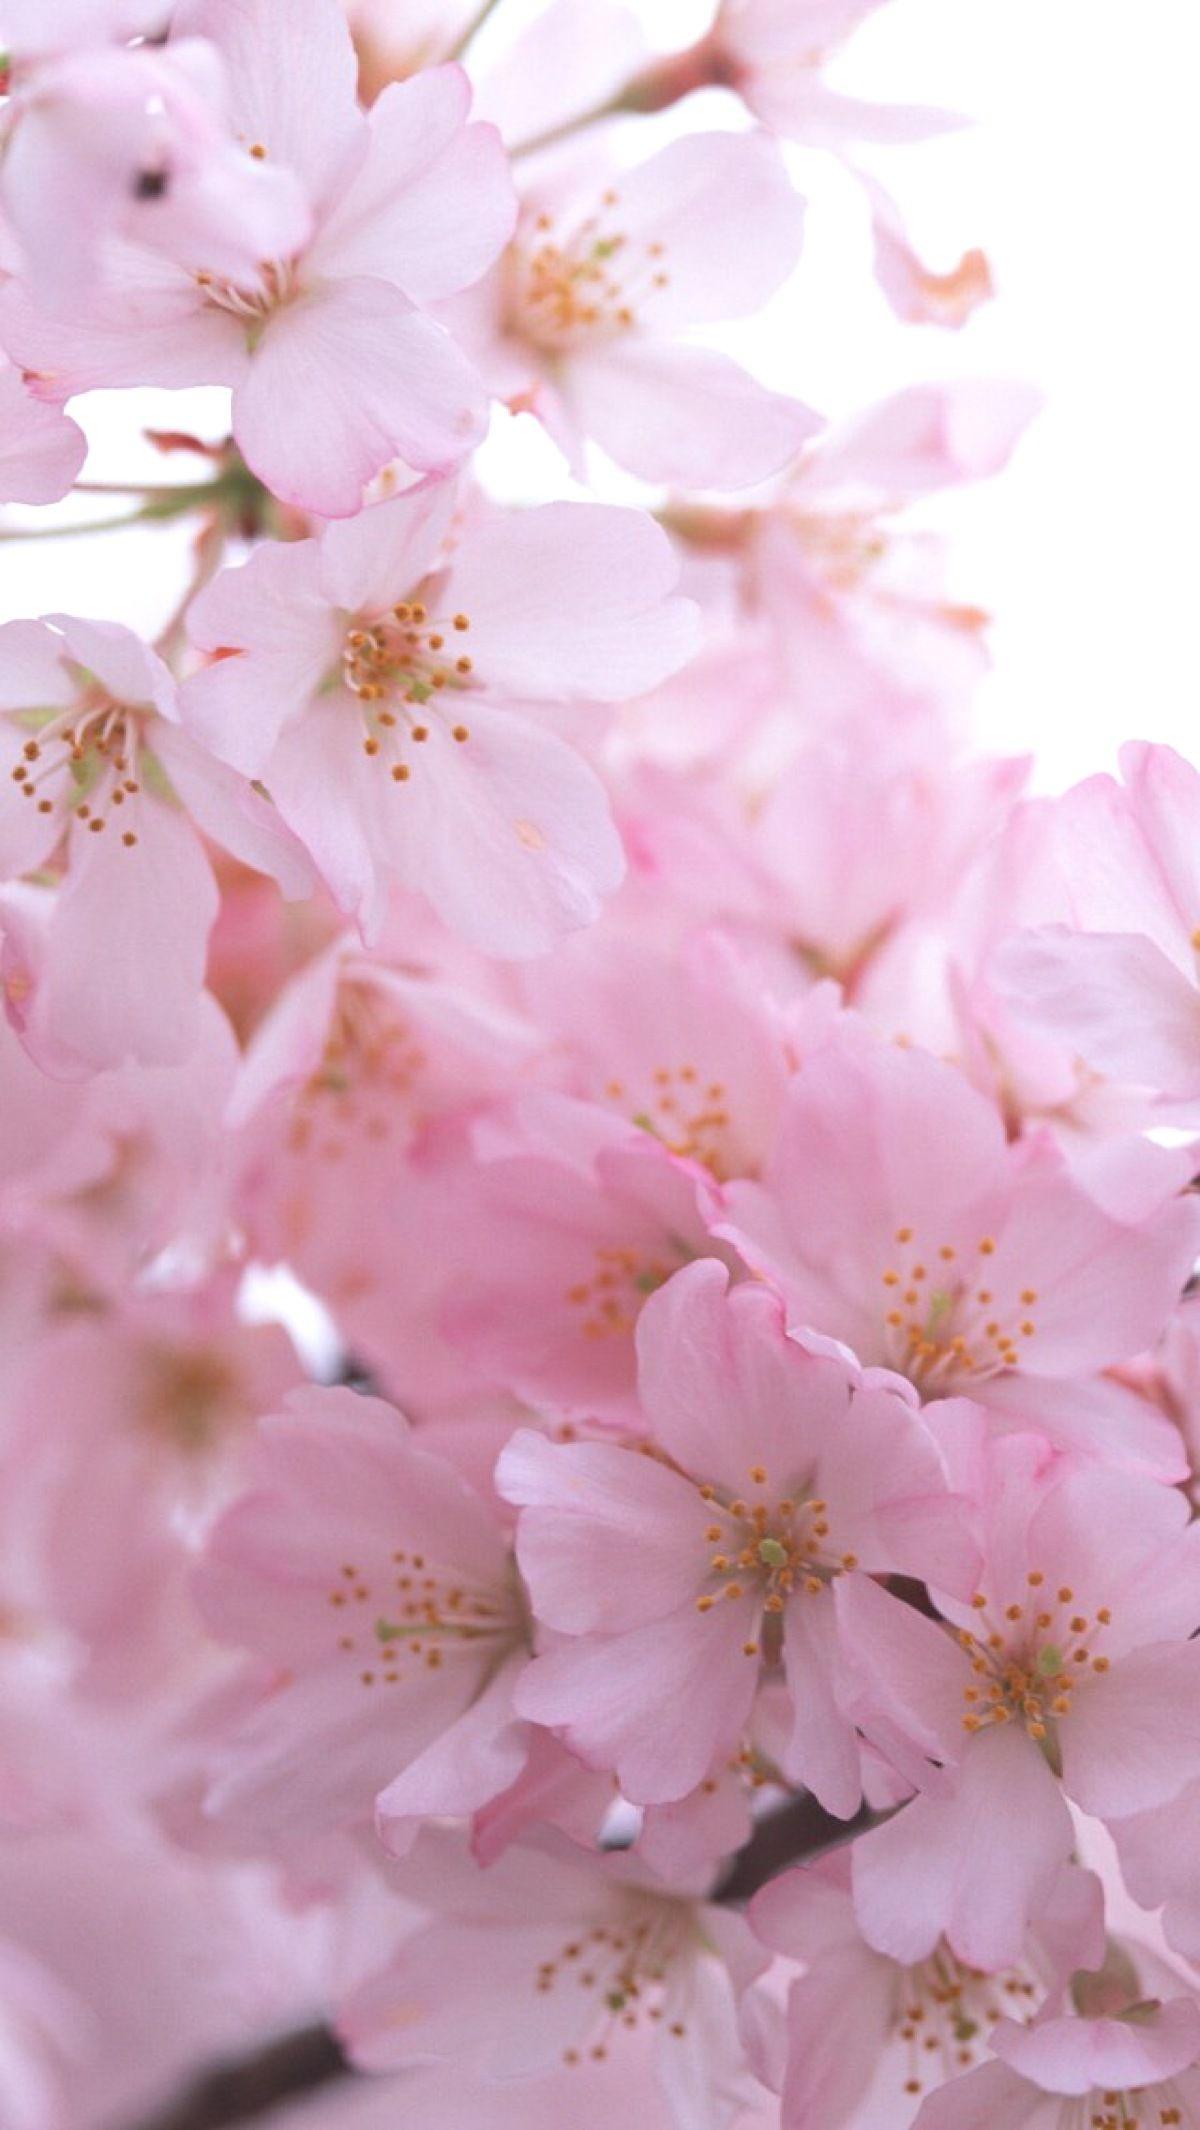 038 Flowers Pink Blossoms Pinterest Iphone Wallpaper Iphone